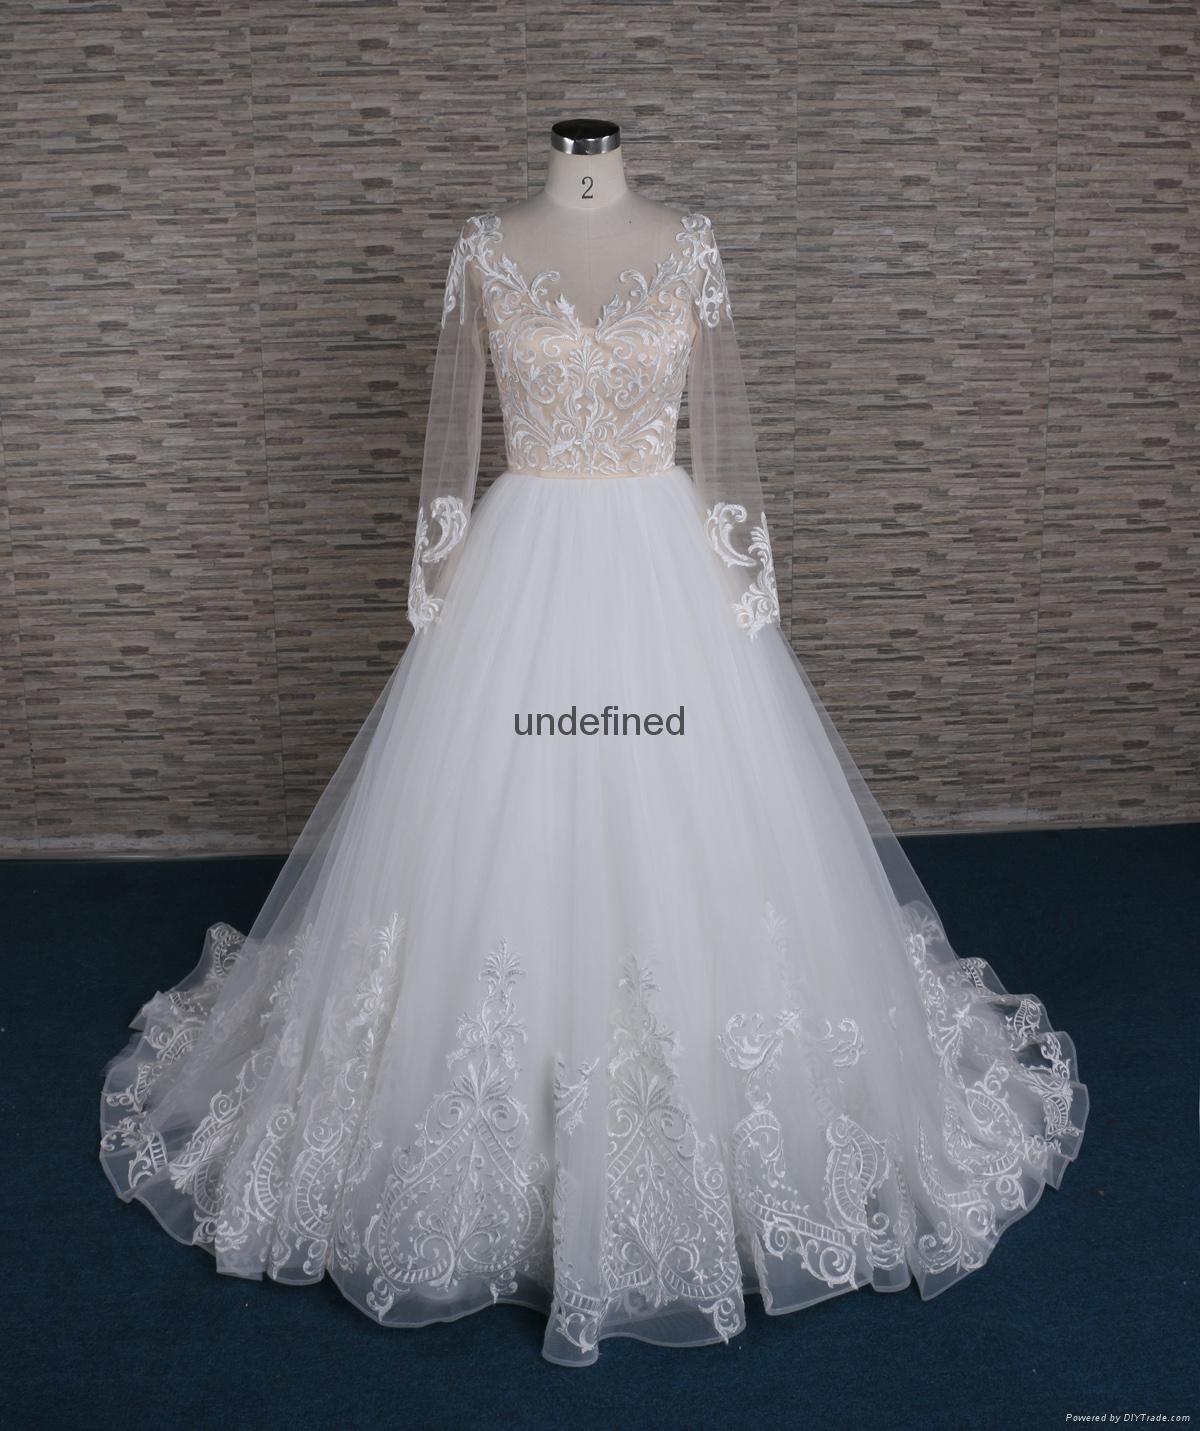 法國蕾絲A-line 婚紗 1